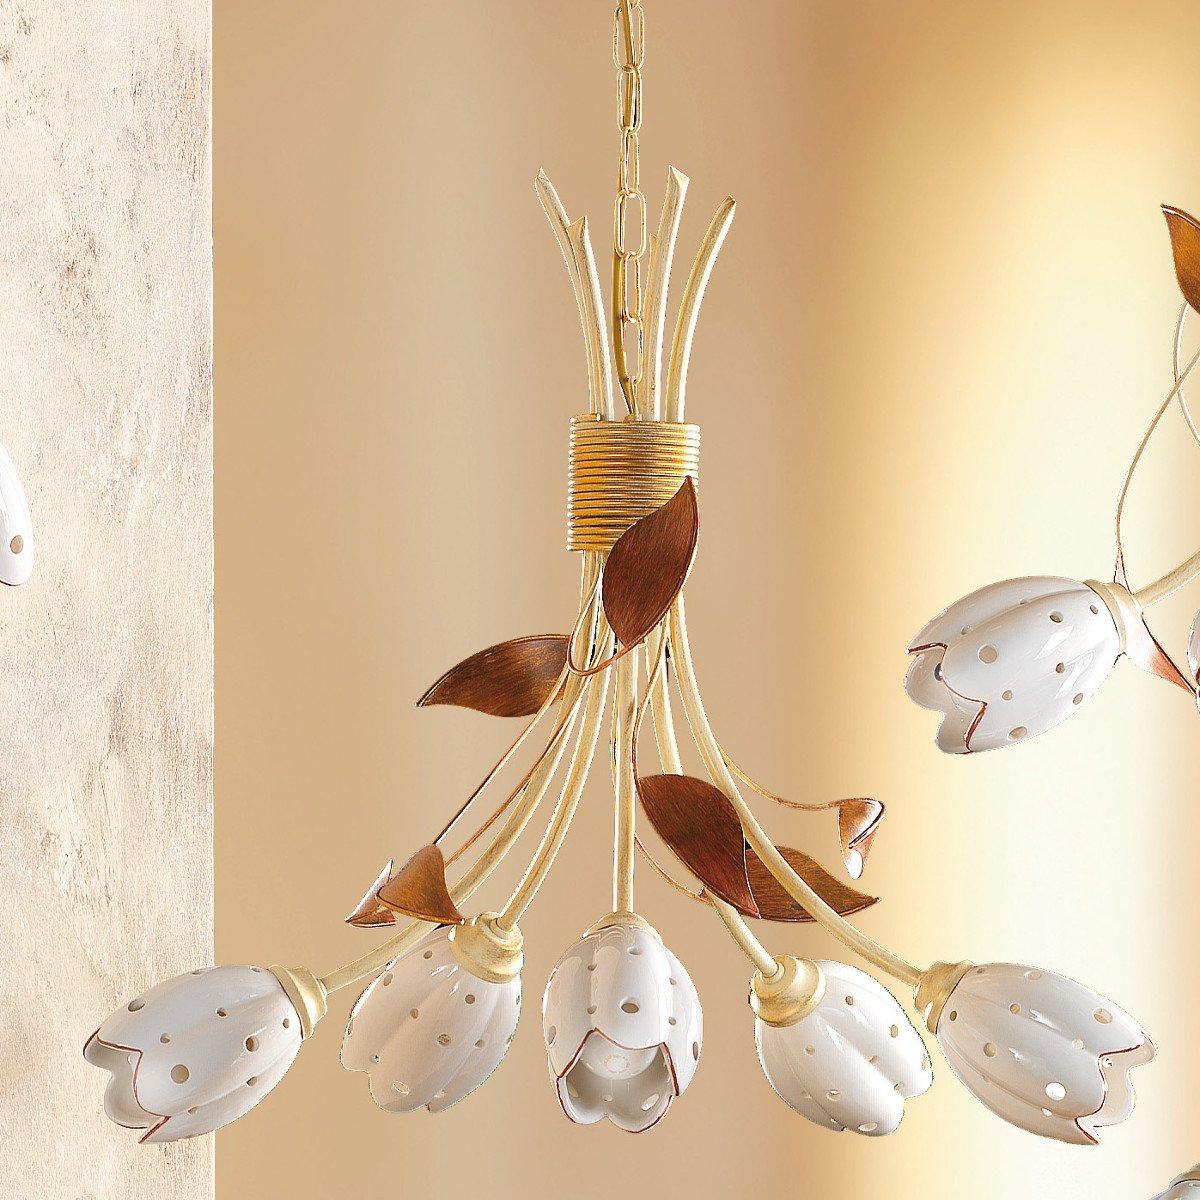 mediterraner florentiner kronleuchter im modernen landhausstil g nstig kaufen bei lampen. Black Bedroom Furniture Sets. Home Design Ideas